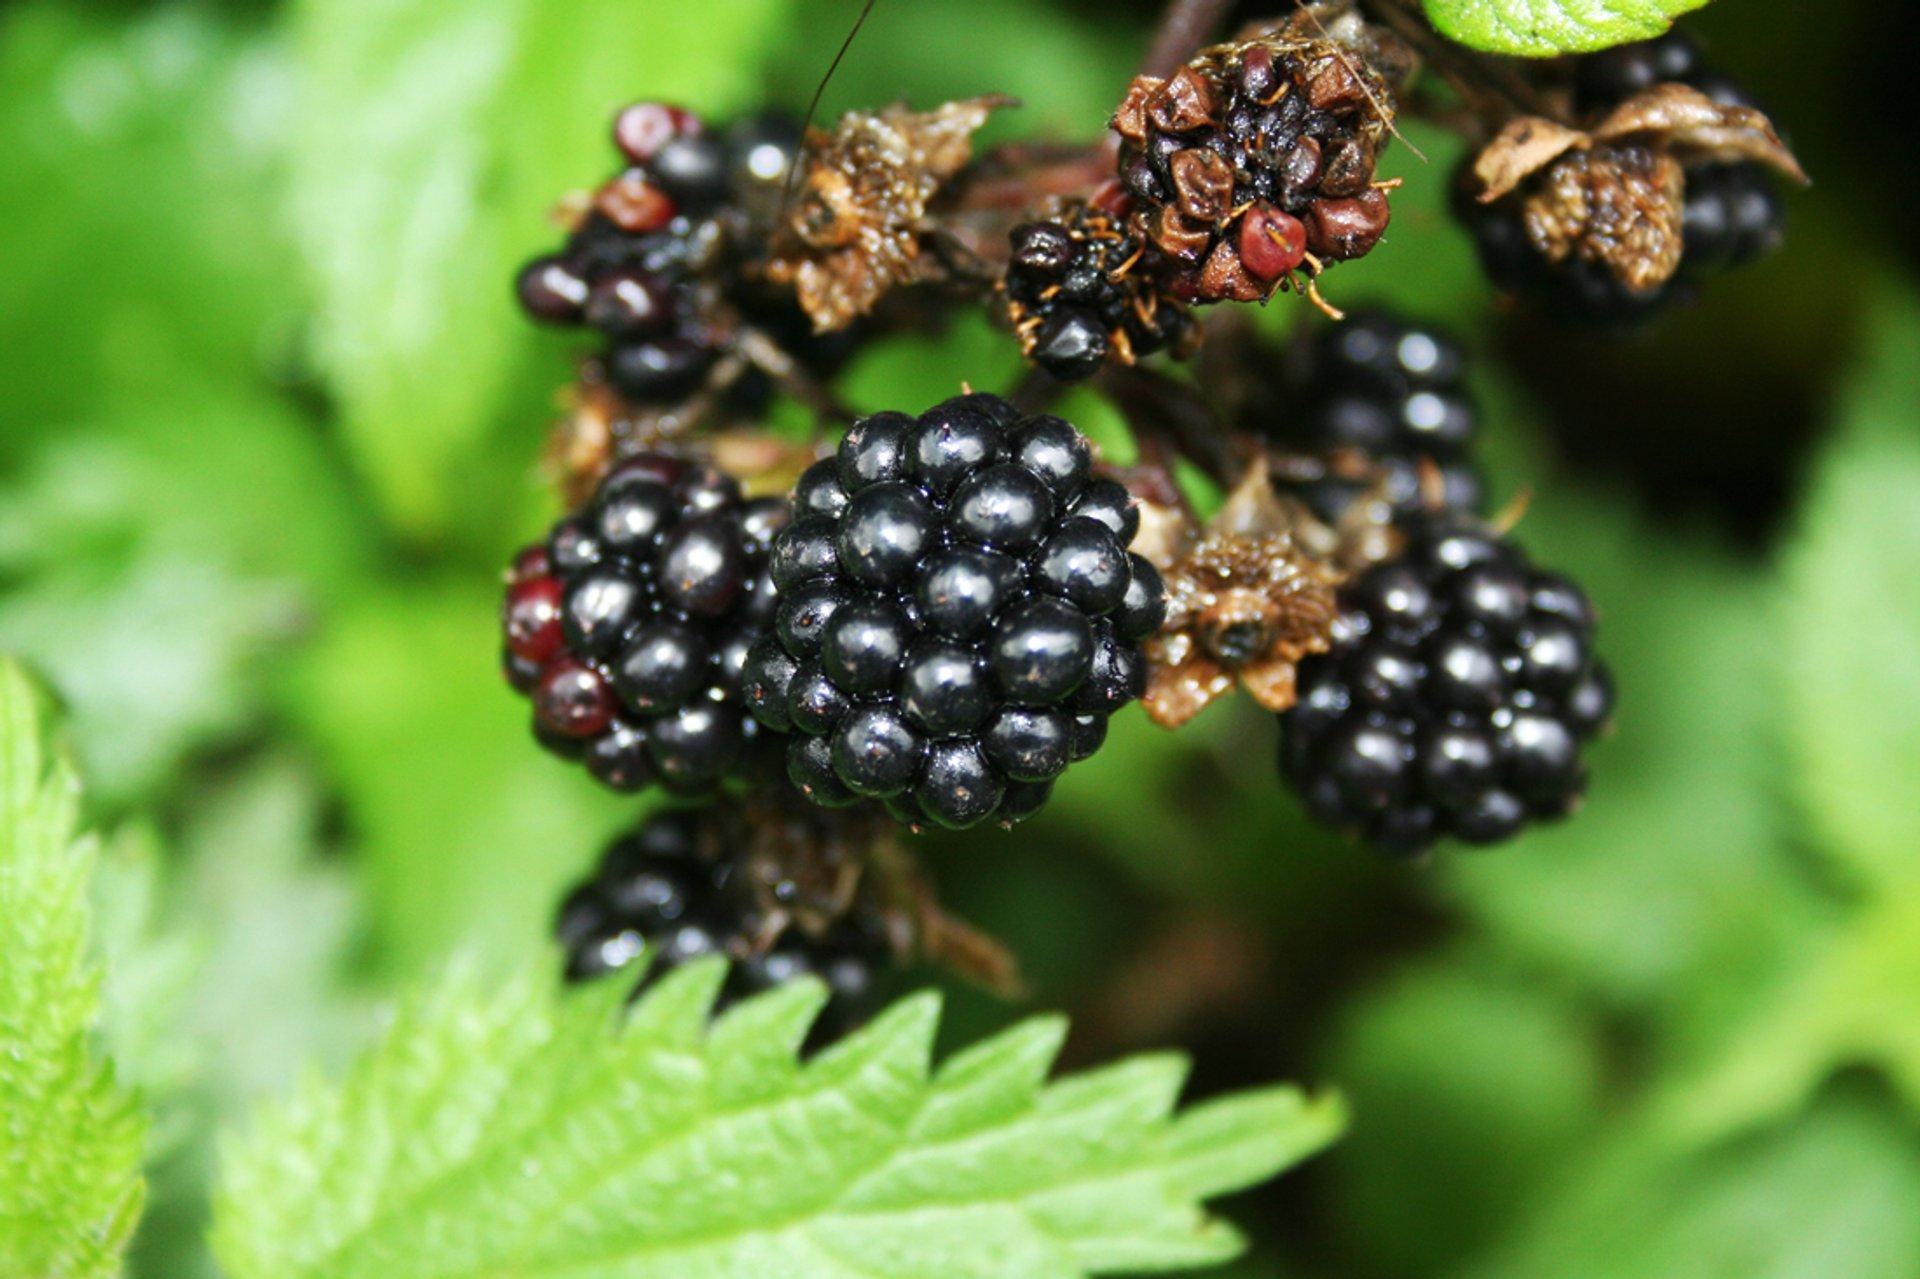 Blackberries in Ireland - Best Season 2020